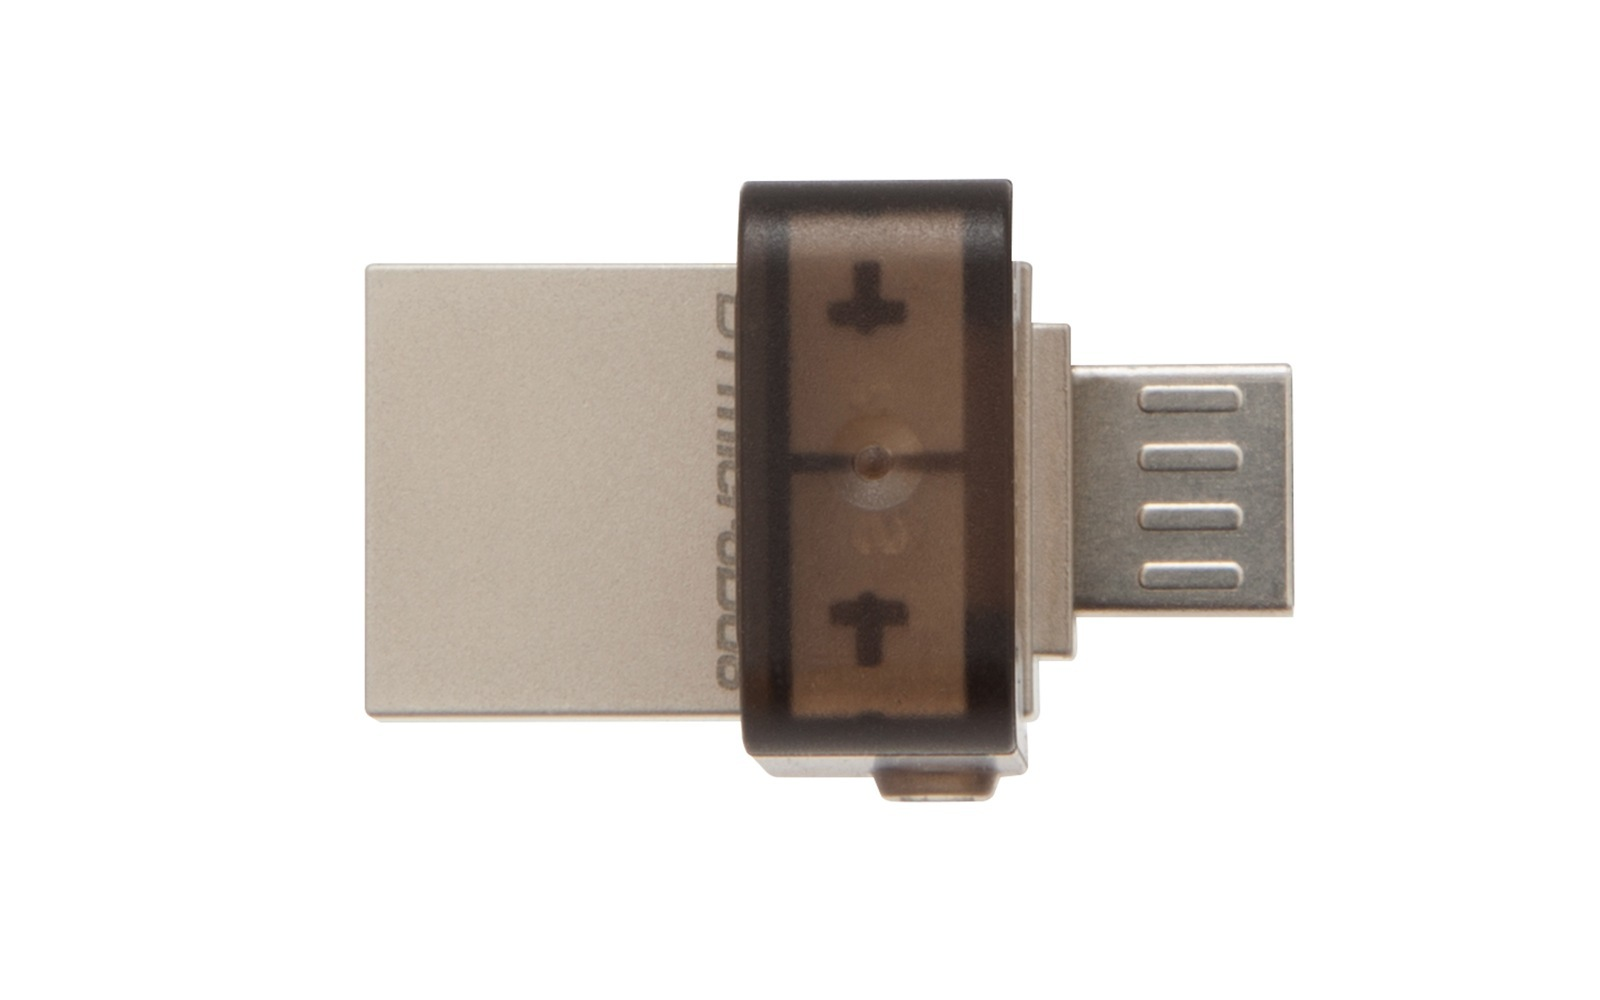 Kingston microDuo USB